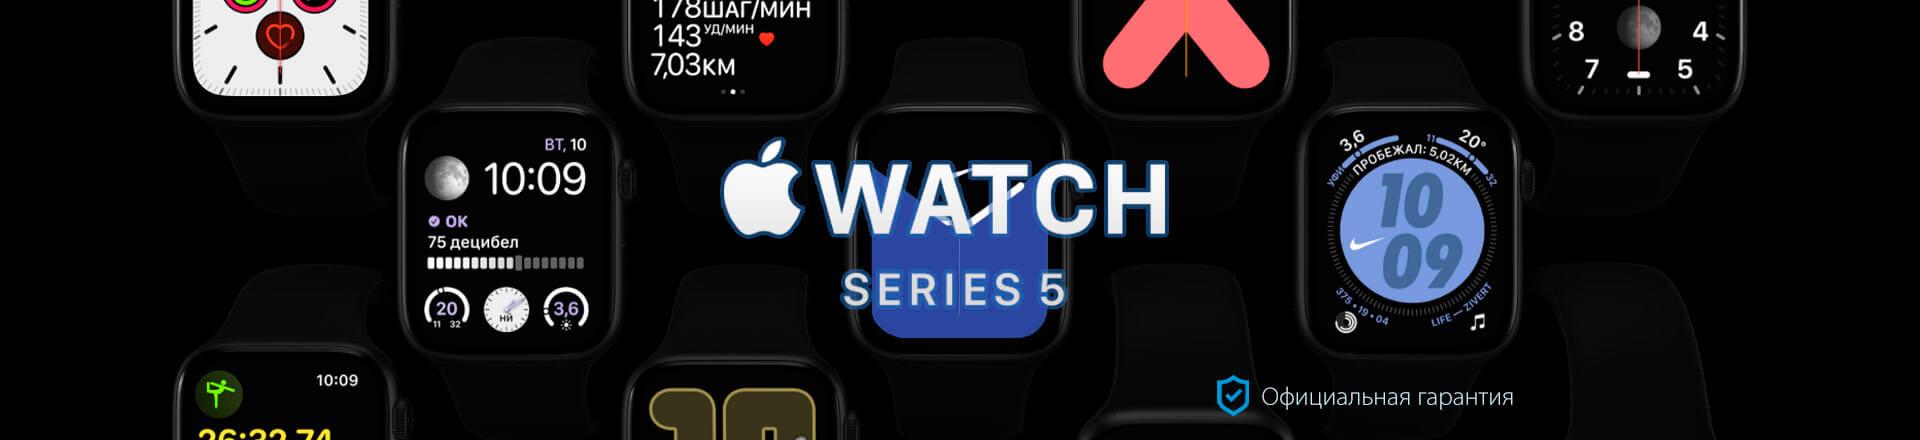 watch-s5